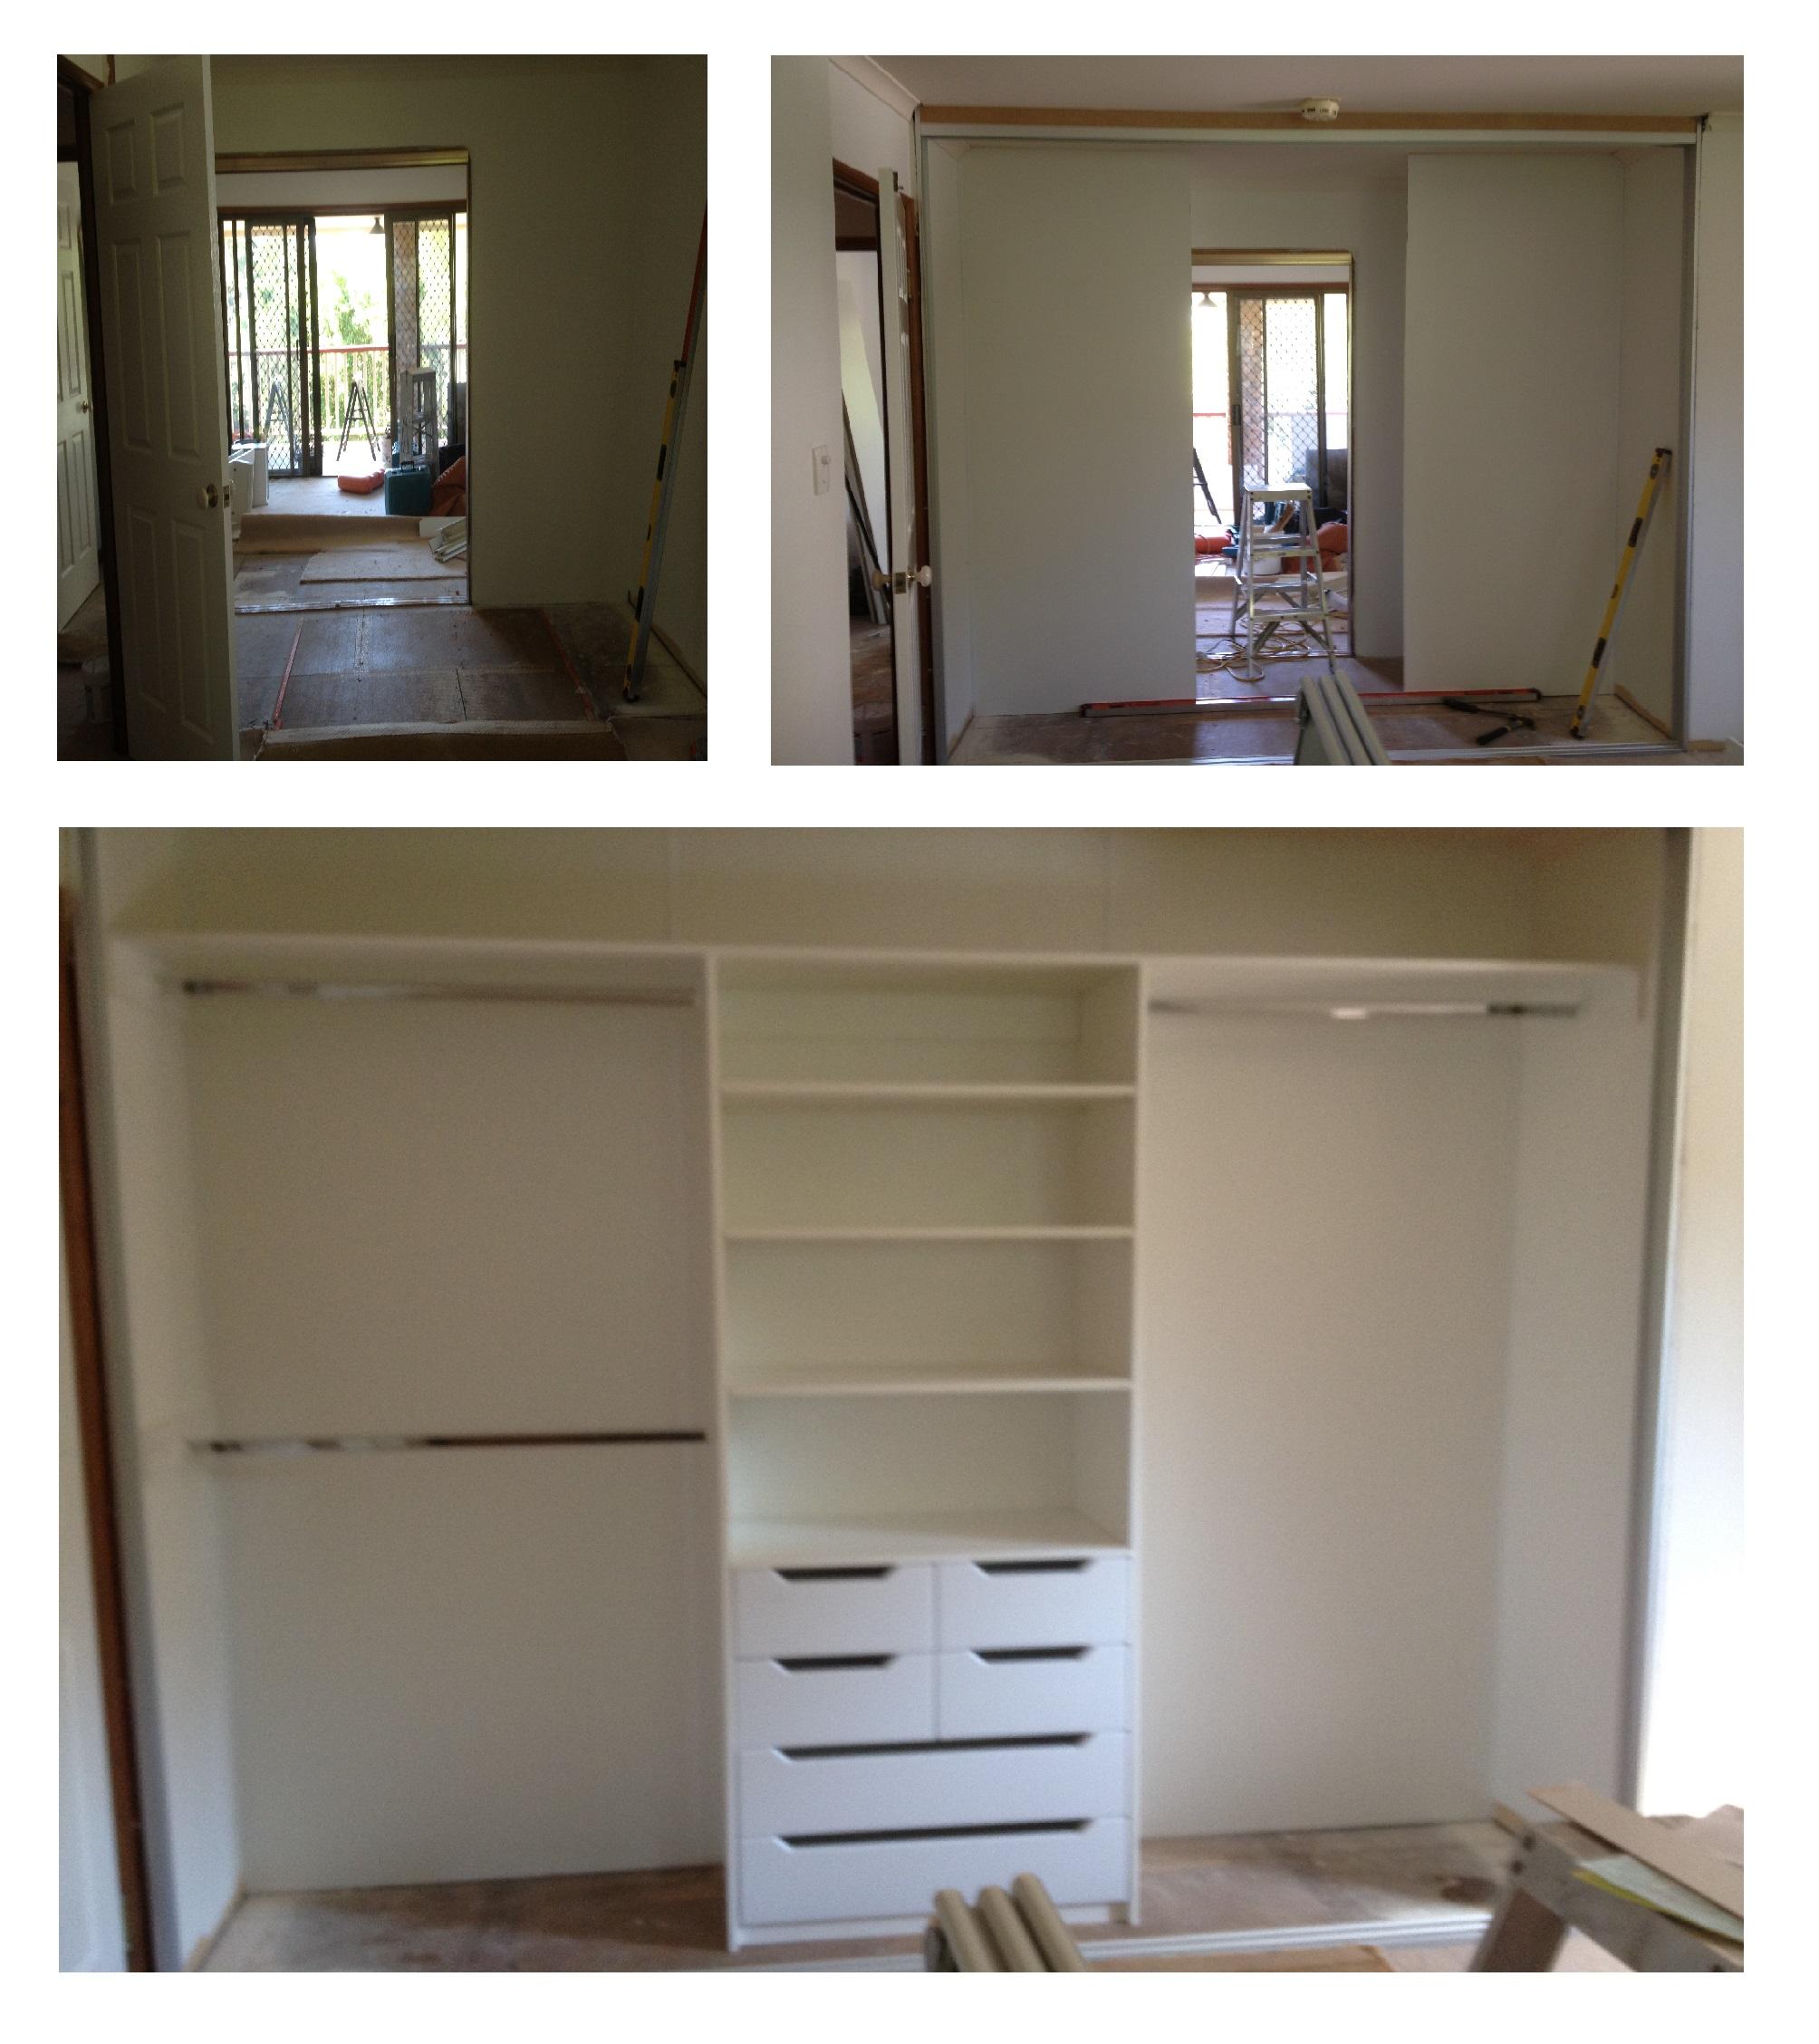 new wardrobe installation